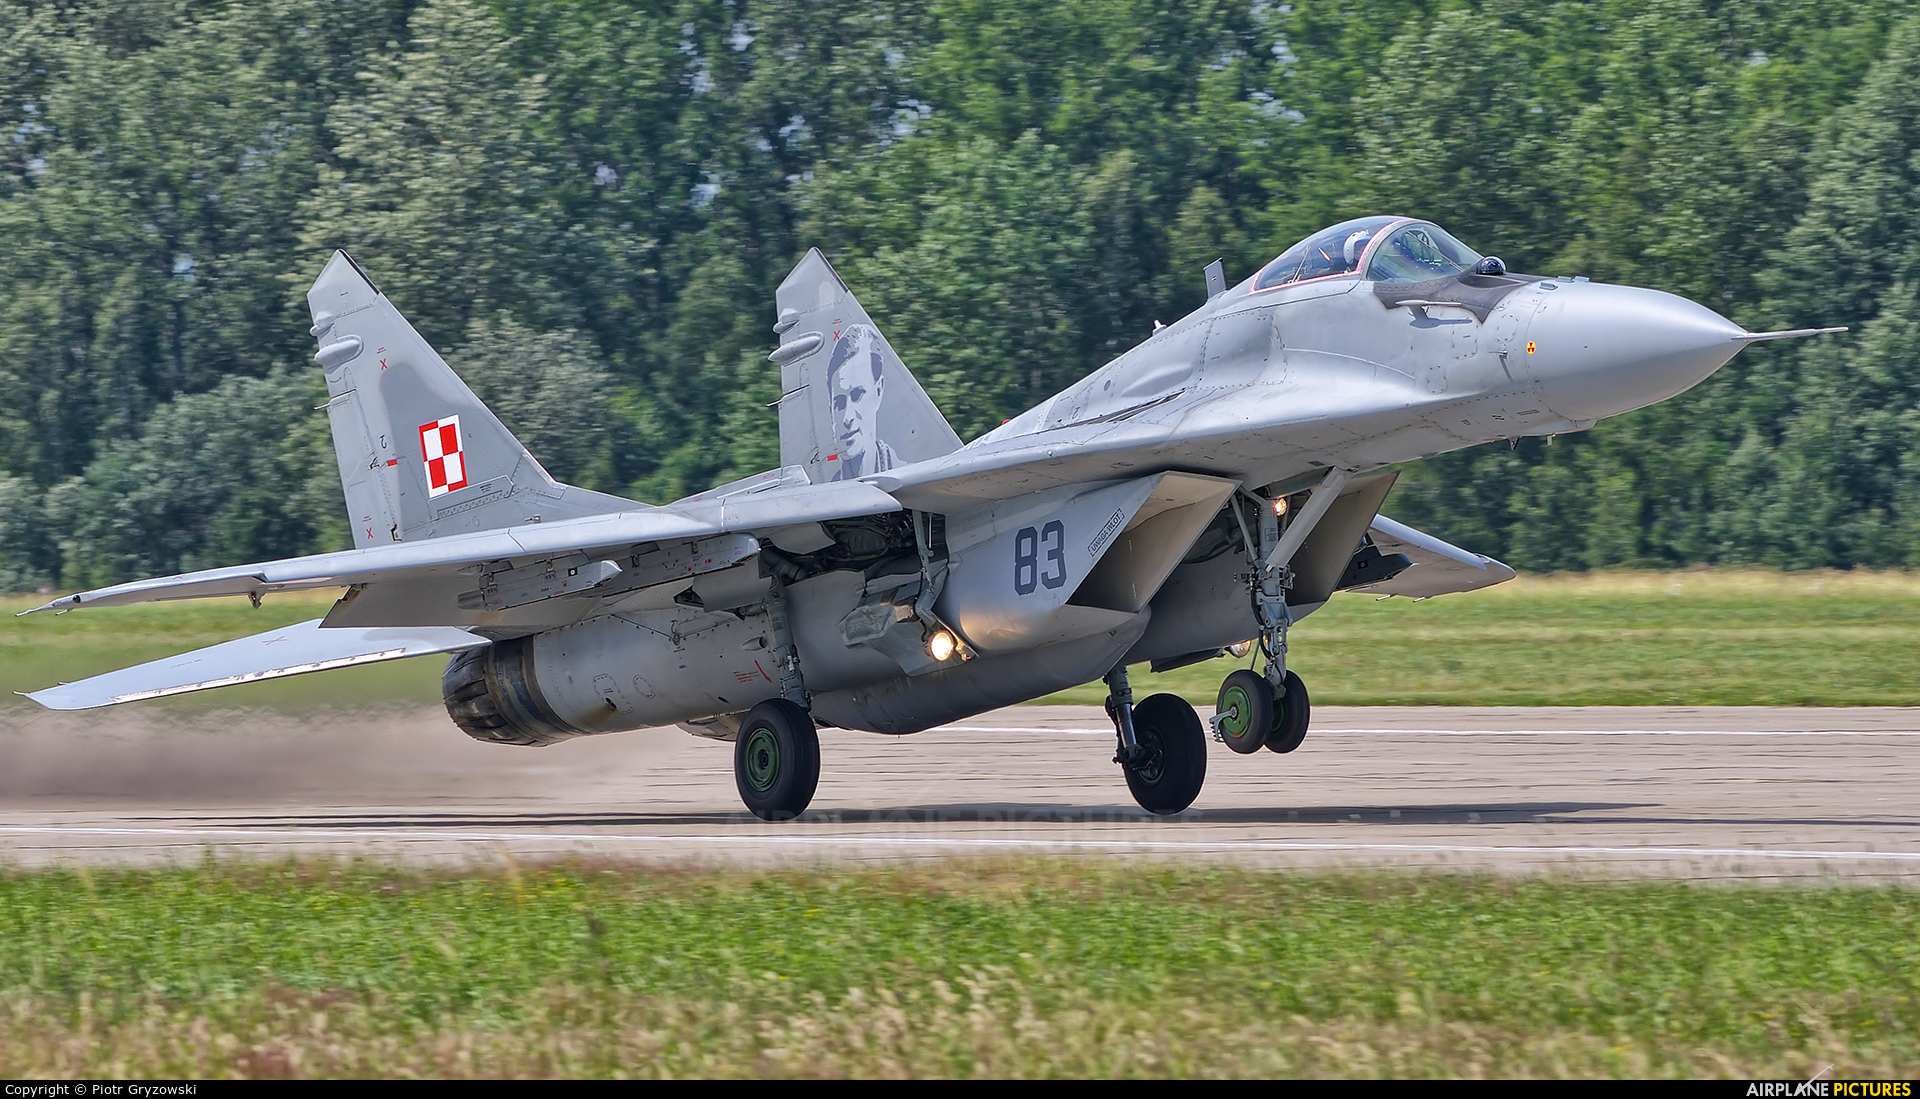 Poland - Air Force 83 aircraft at Mińsk Mazowiecki